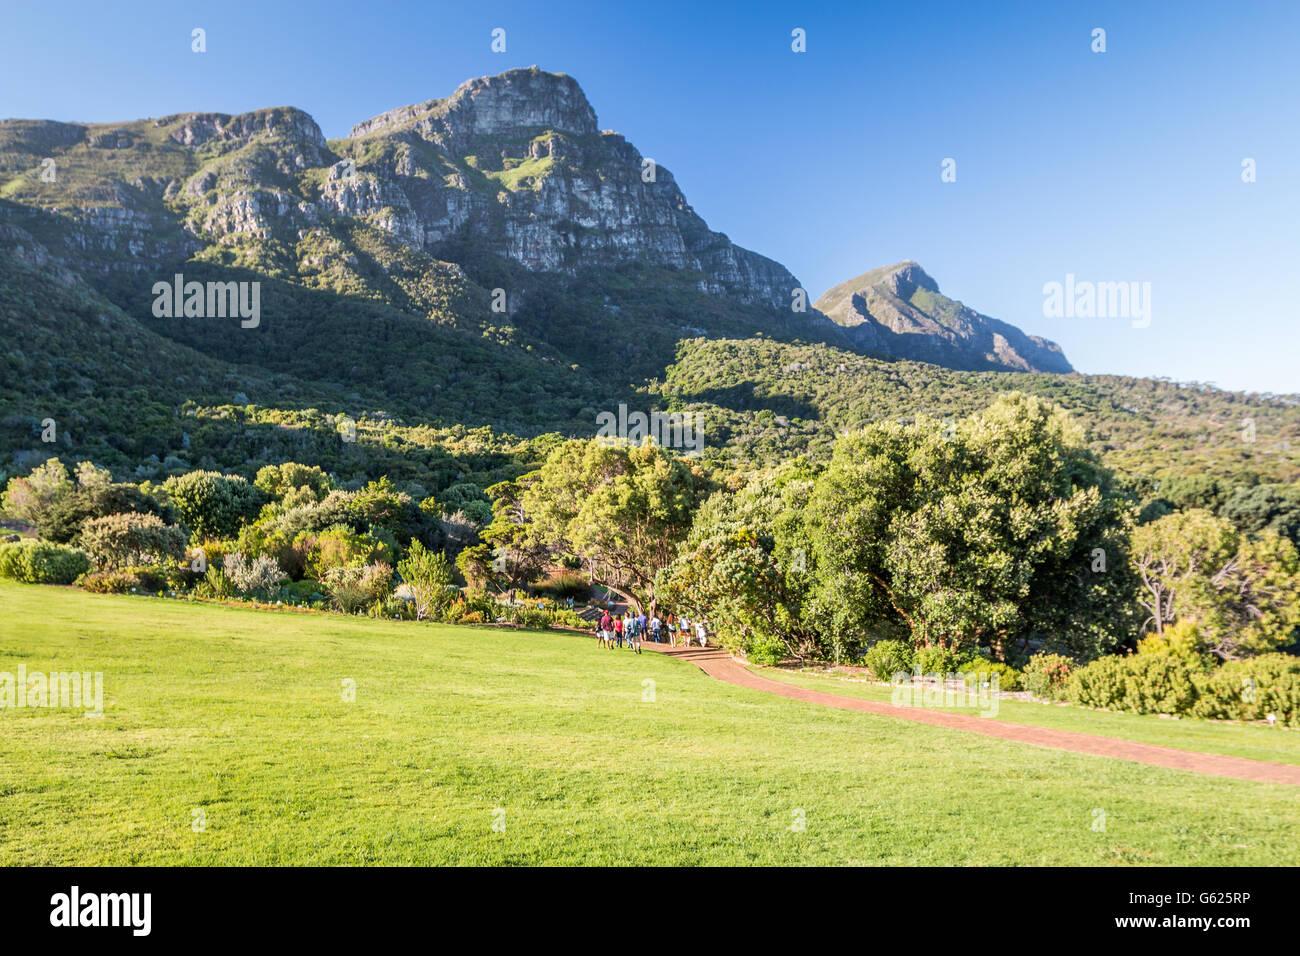 Kirstenbosch National Botanical Garden, Cape Town South Africa - Stock Image